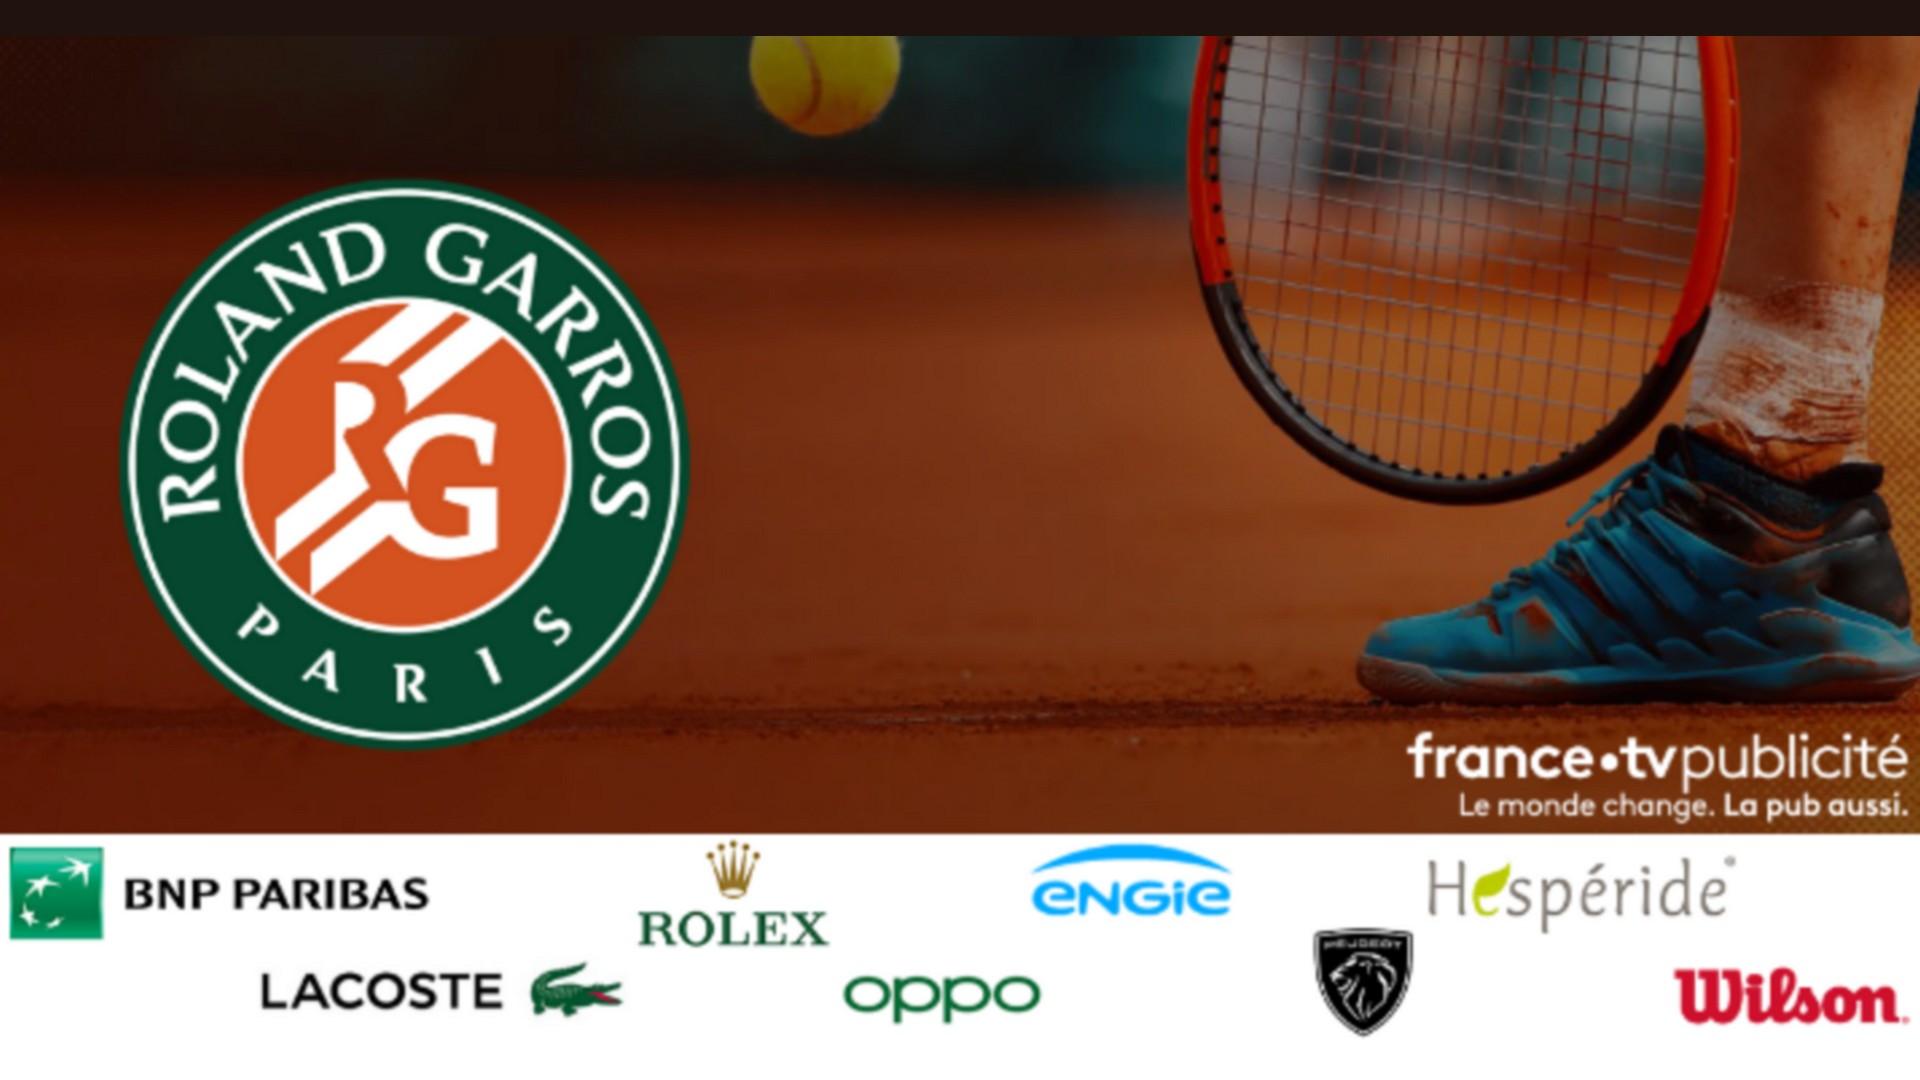 France TV Roland Garros Partenariats